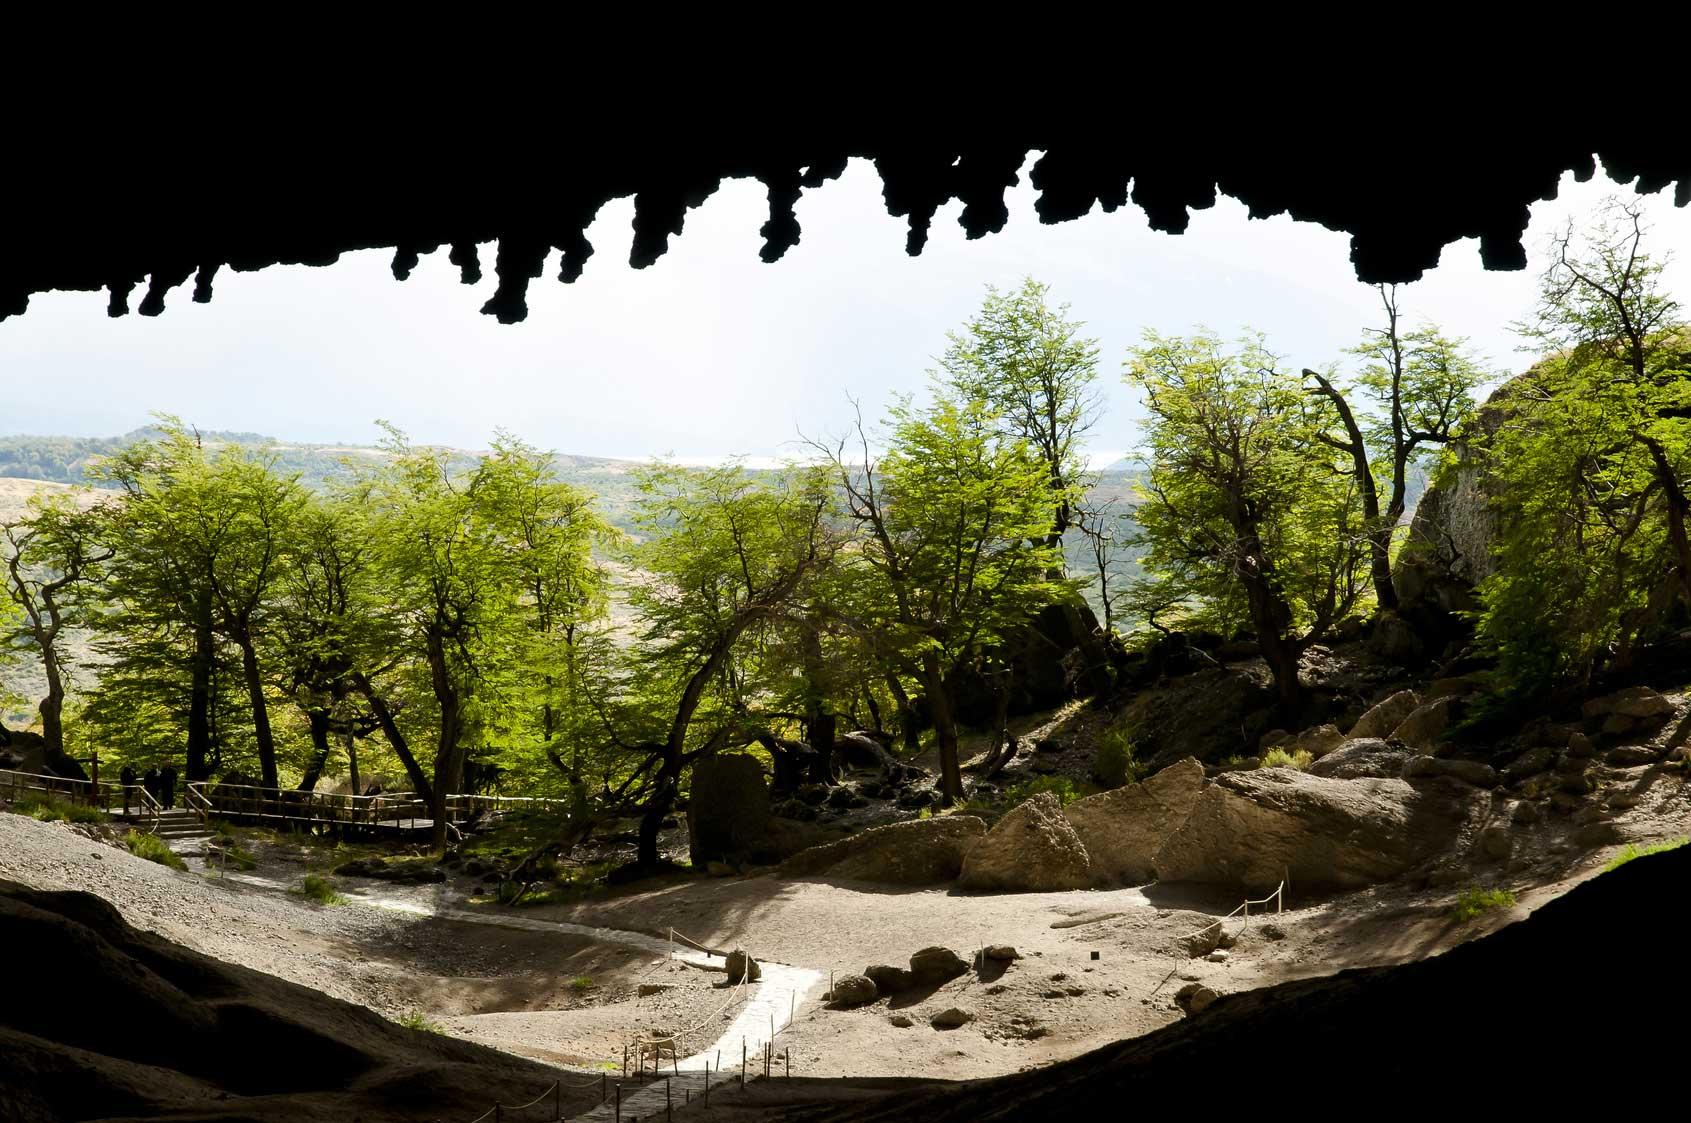 TDF-Torres-Del-Paine-Cueva-Del-Milodon-Cave-5-8-2020